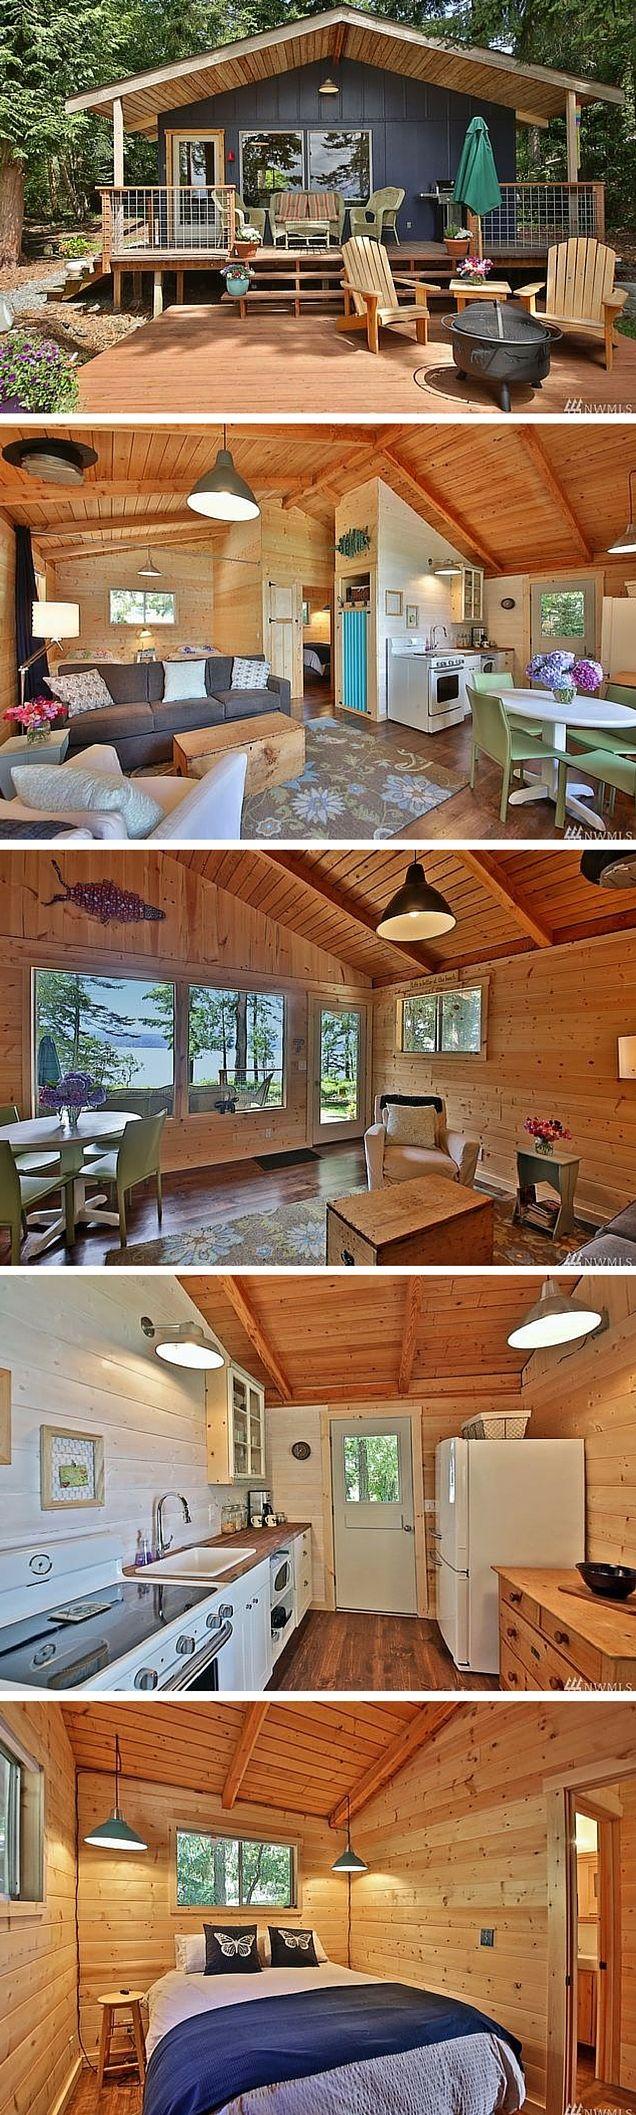 A 528 sq ft cabin in Langley, Washington